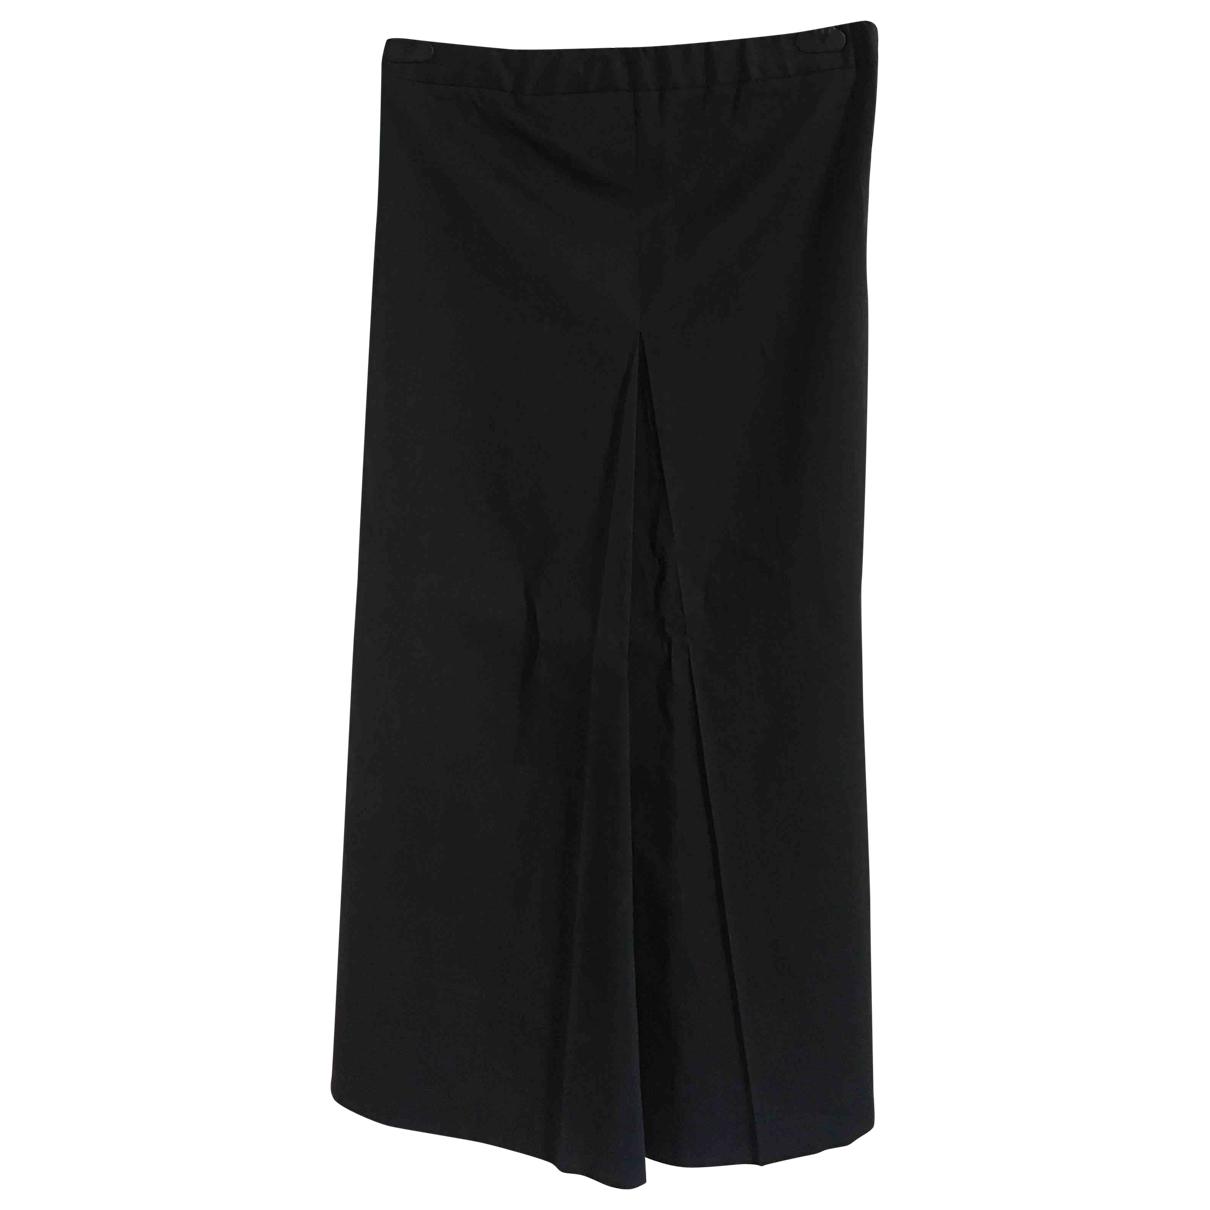 Maison Martin Margiela \N Black Cotton Trousers for Women 44 IT